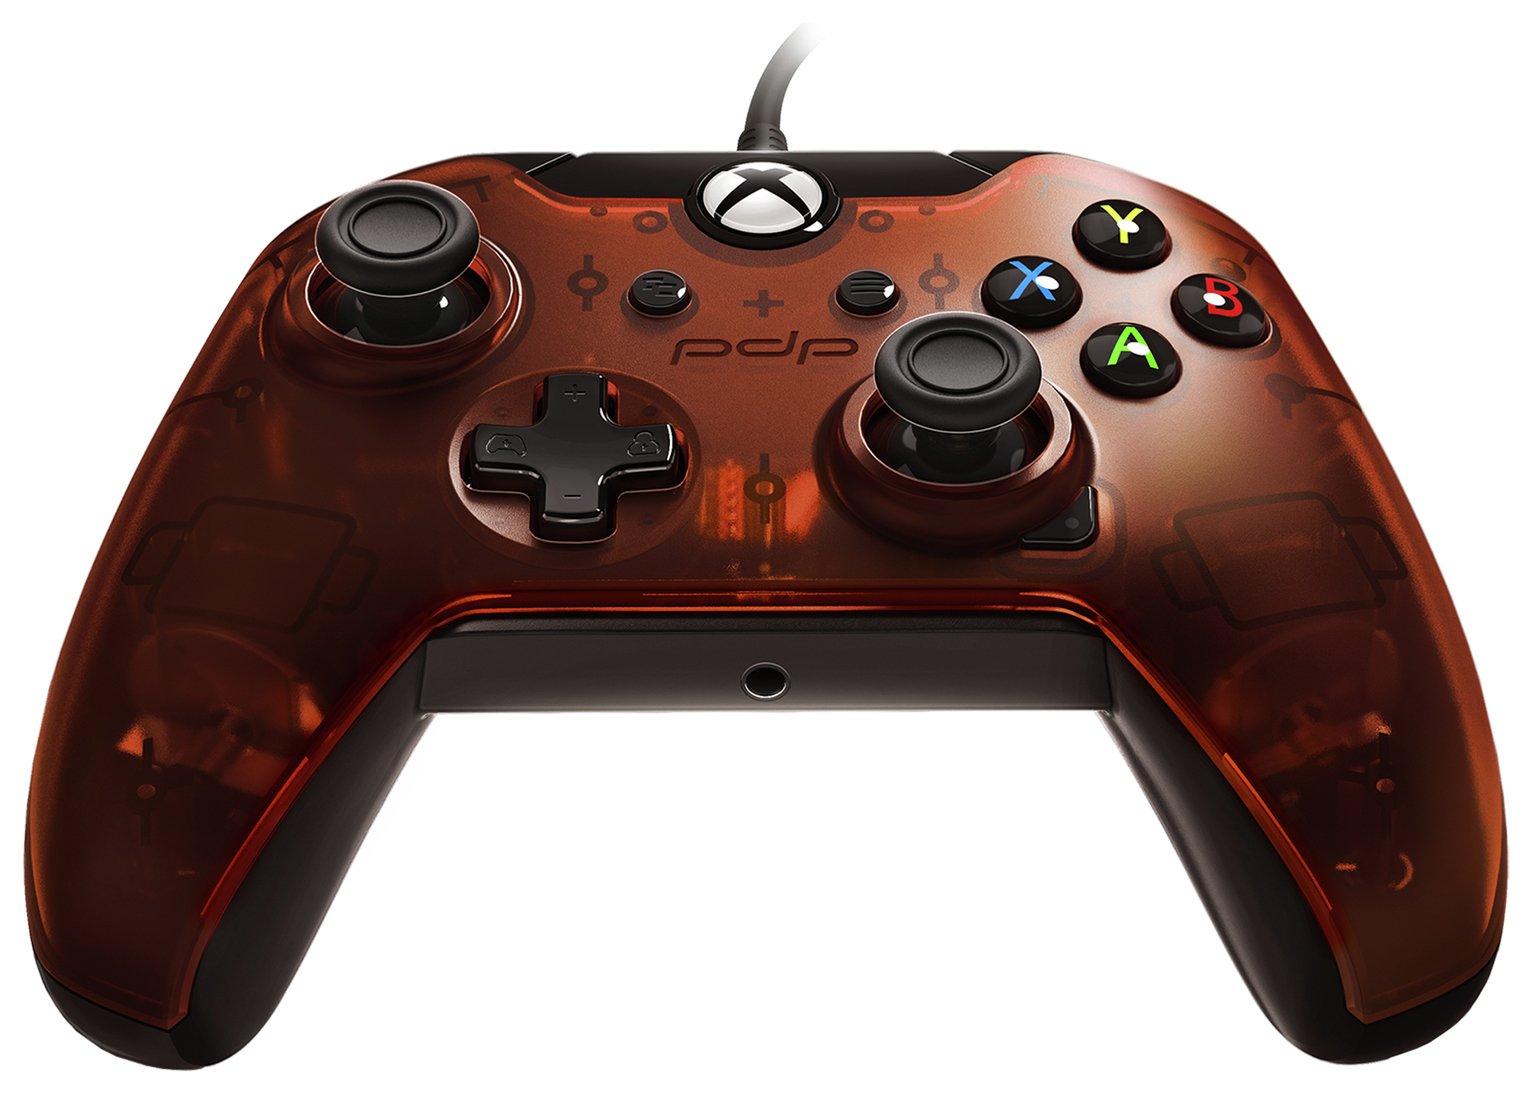 PDP Xbox One Controller Orange - £13.99 @ Argos